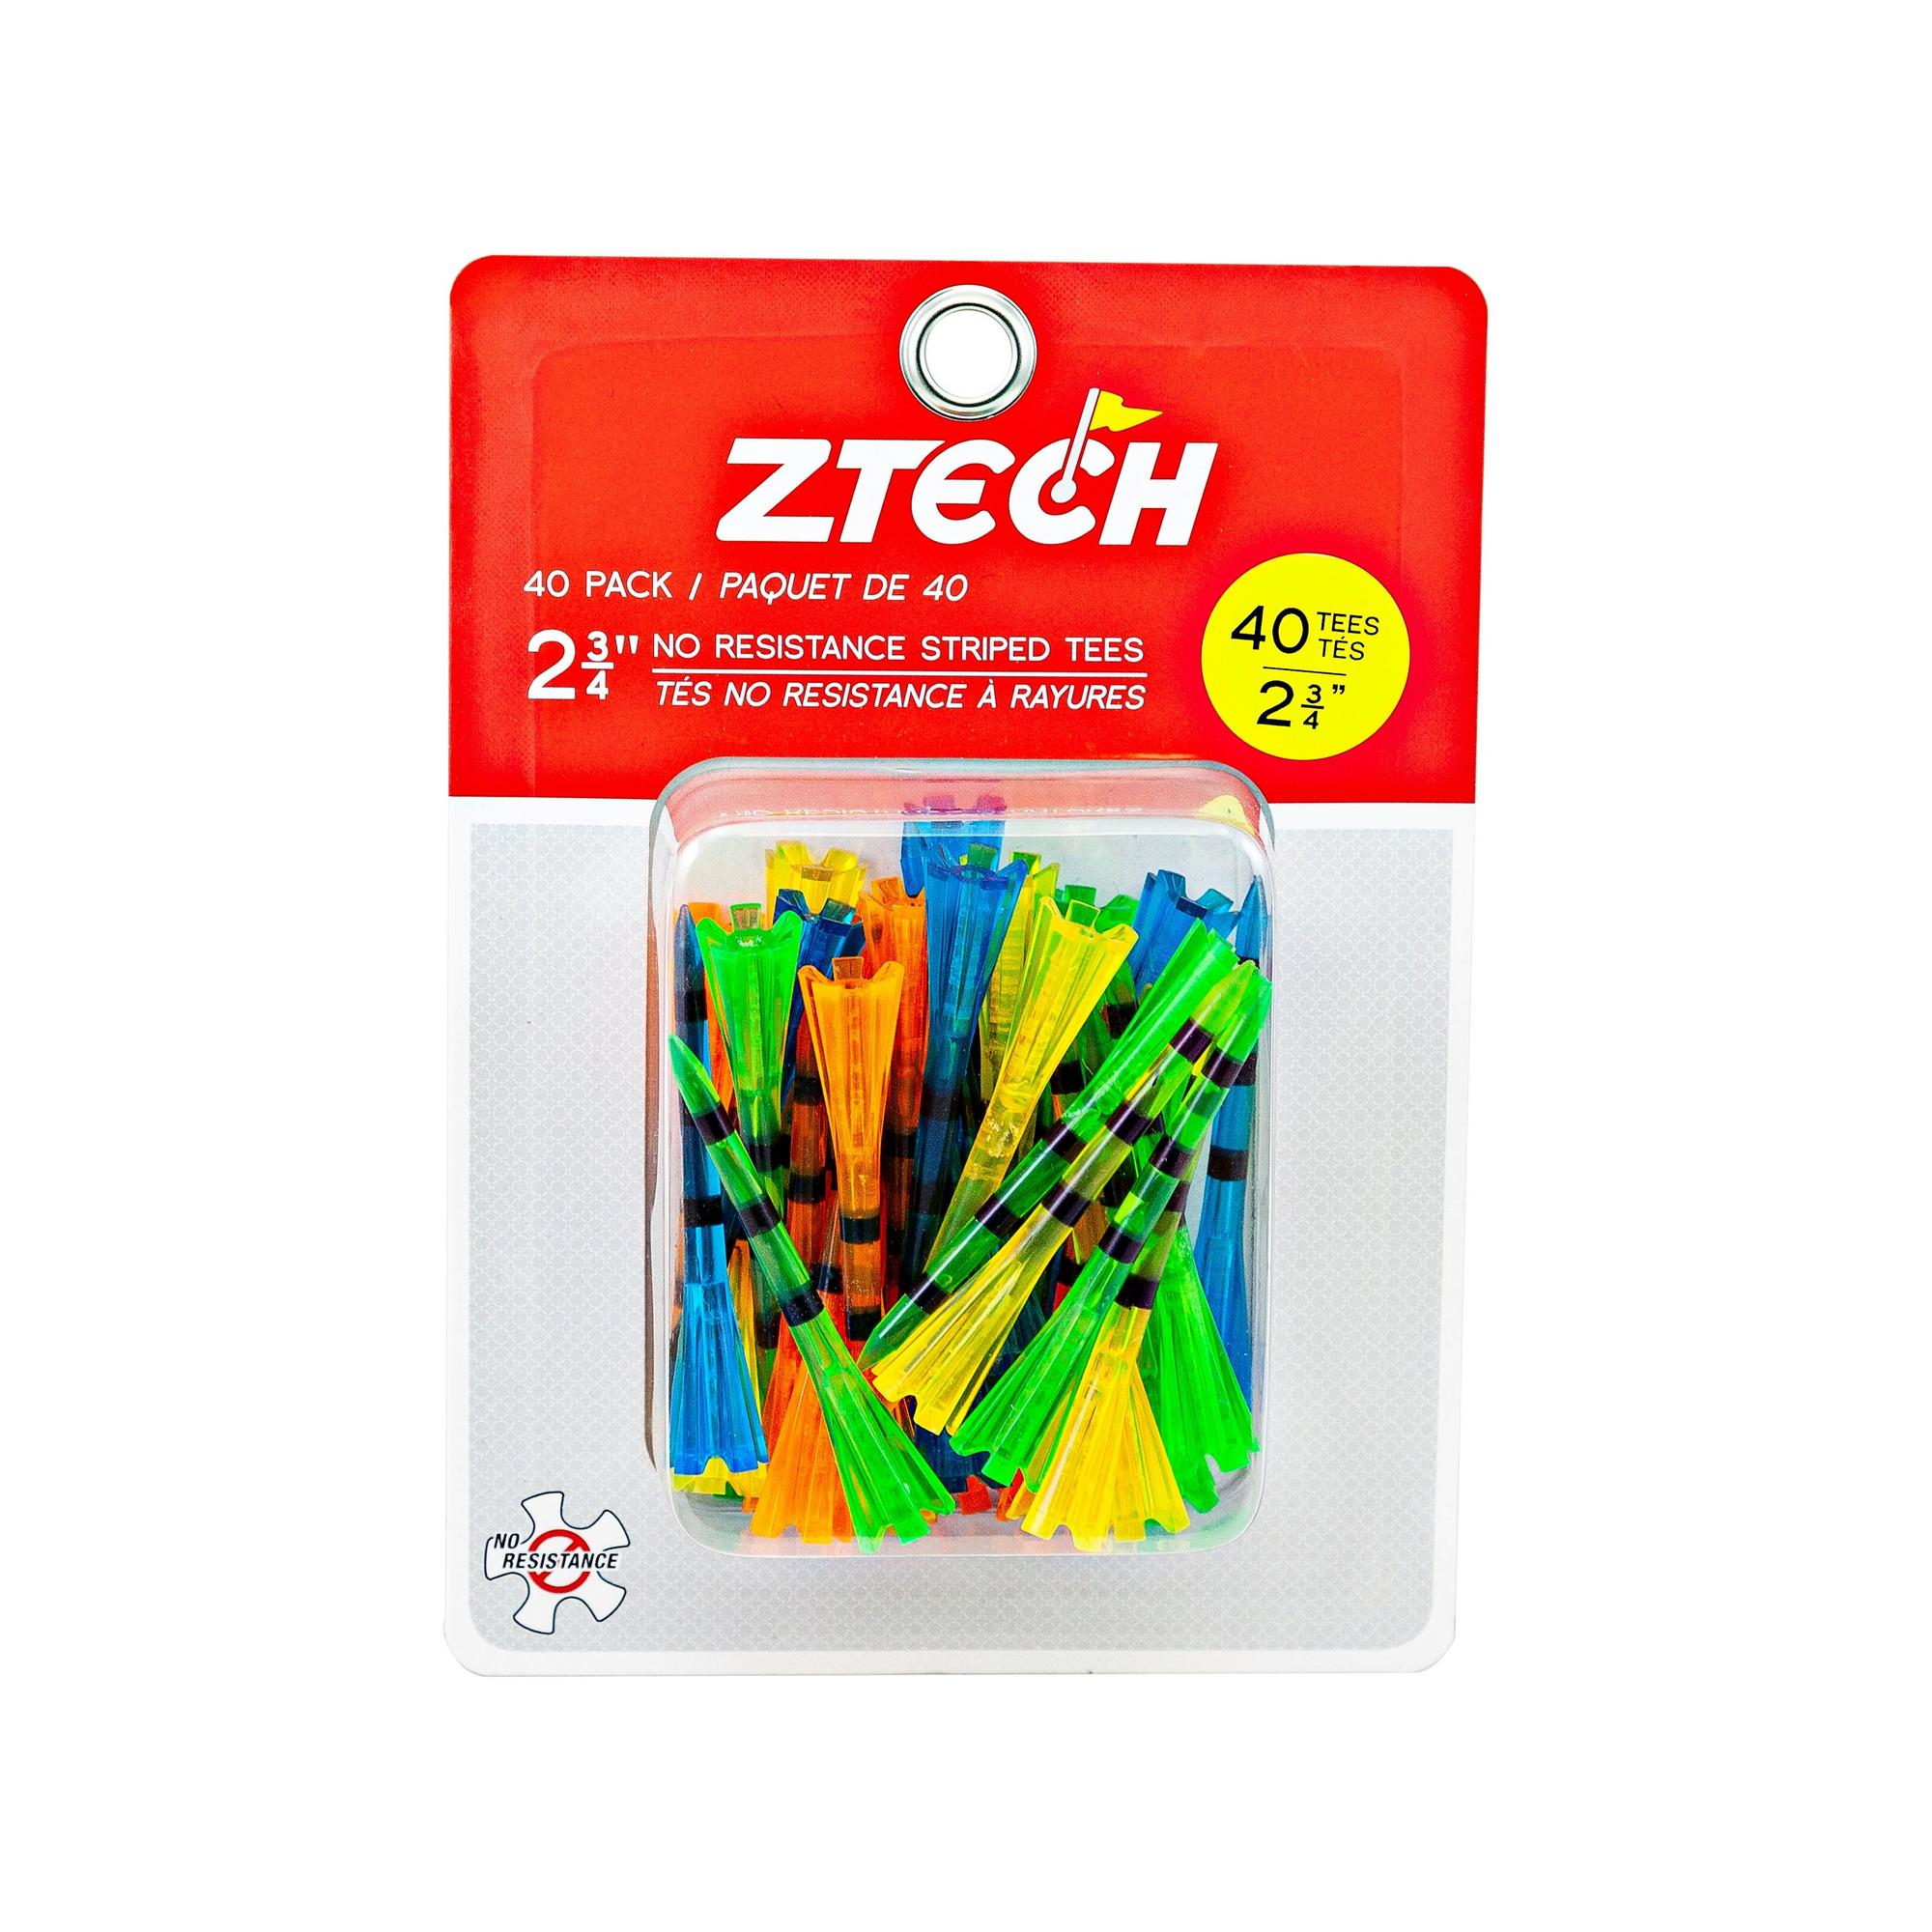 "ZTECH Translucent tees 2 3/4"" 40 pack"